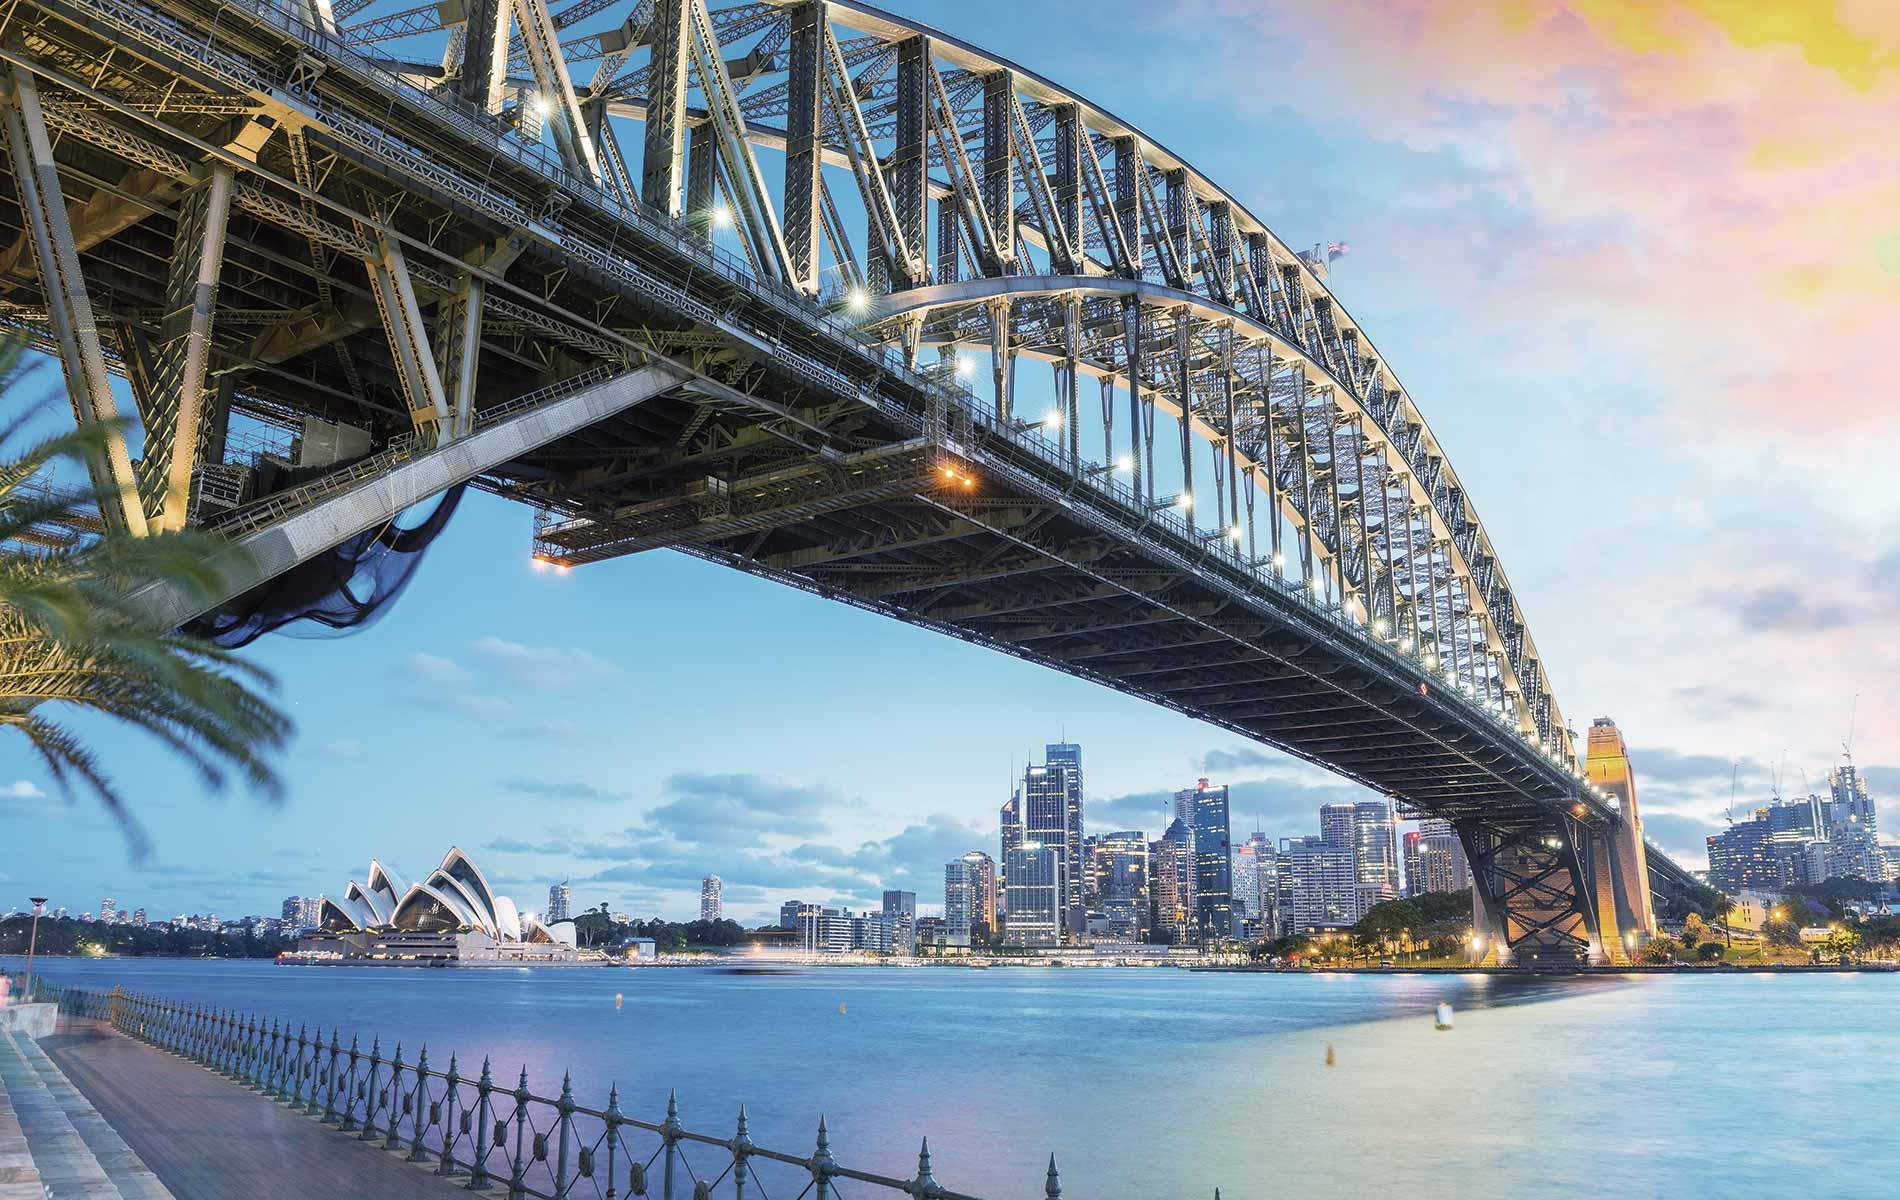 Sydney, Australia with the iconic Sydney Opera House and the Sydney Harbour Bridge Skylines of the World